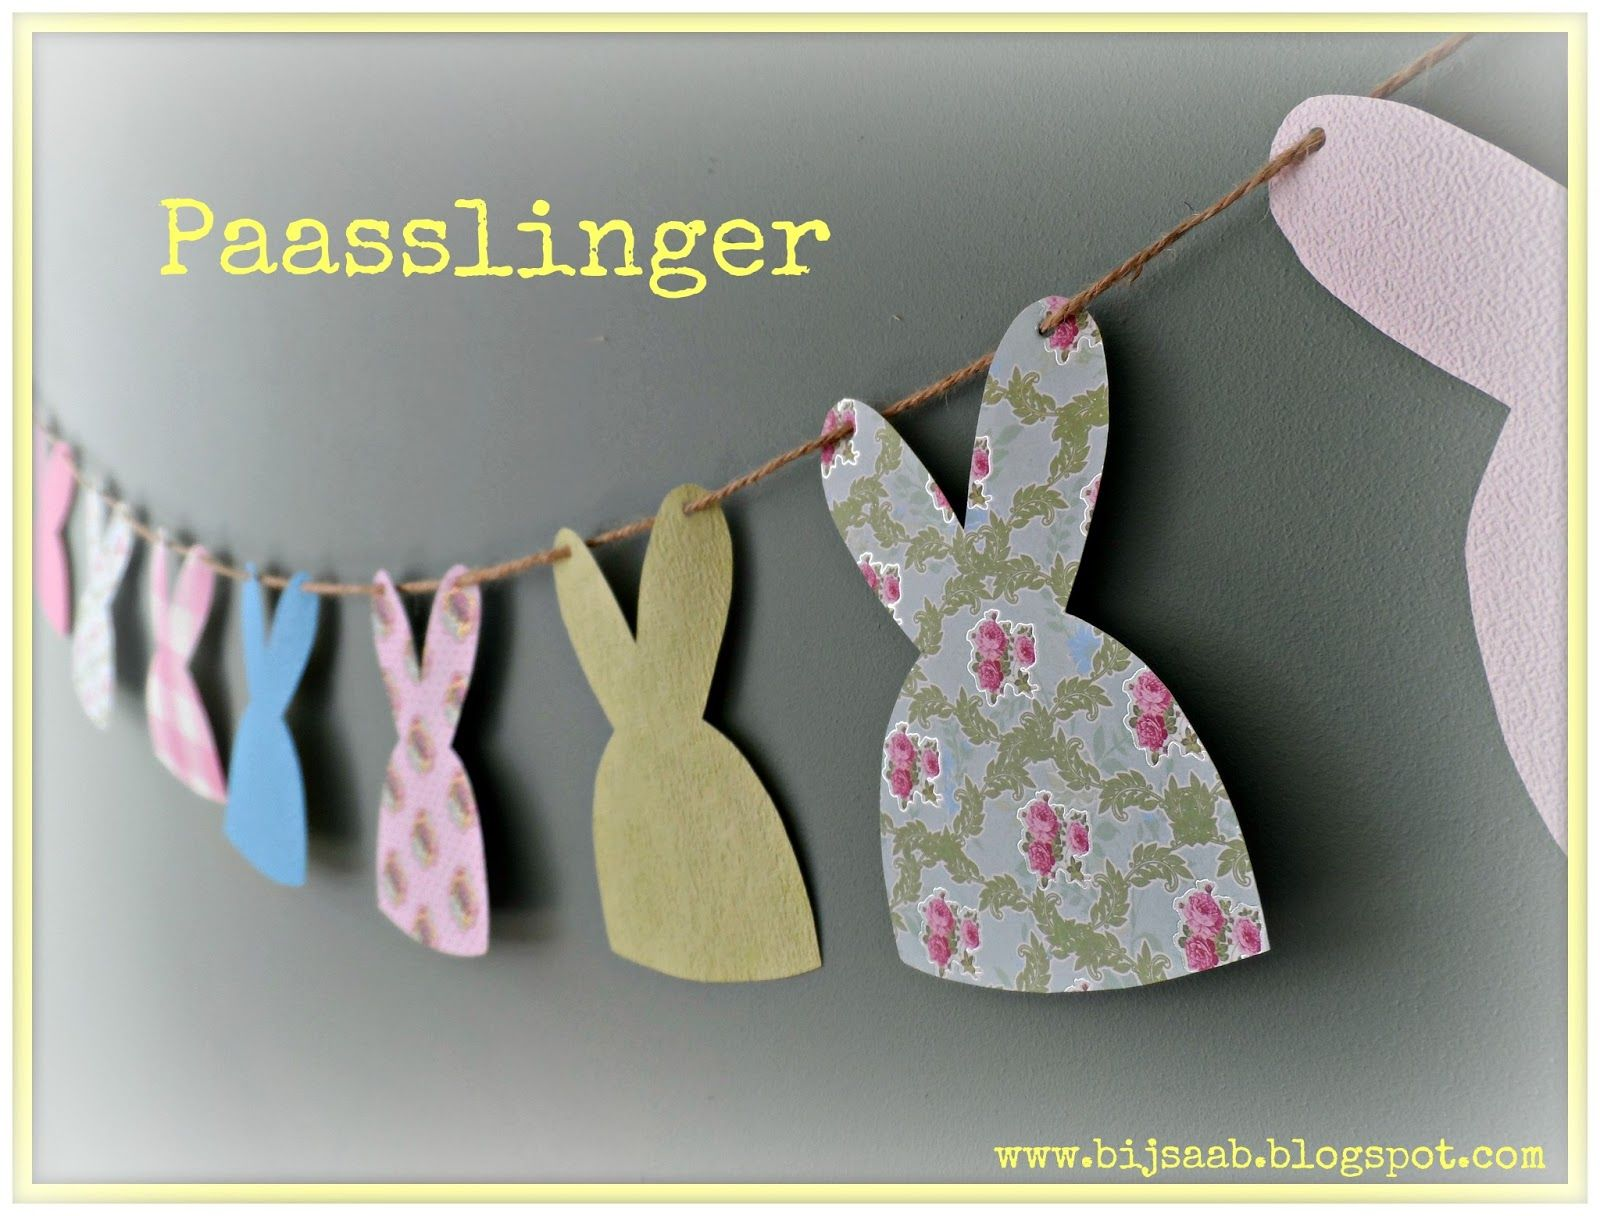 Bij Saab: Paasslinger. #Easter #garland